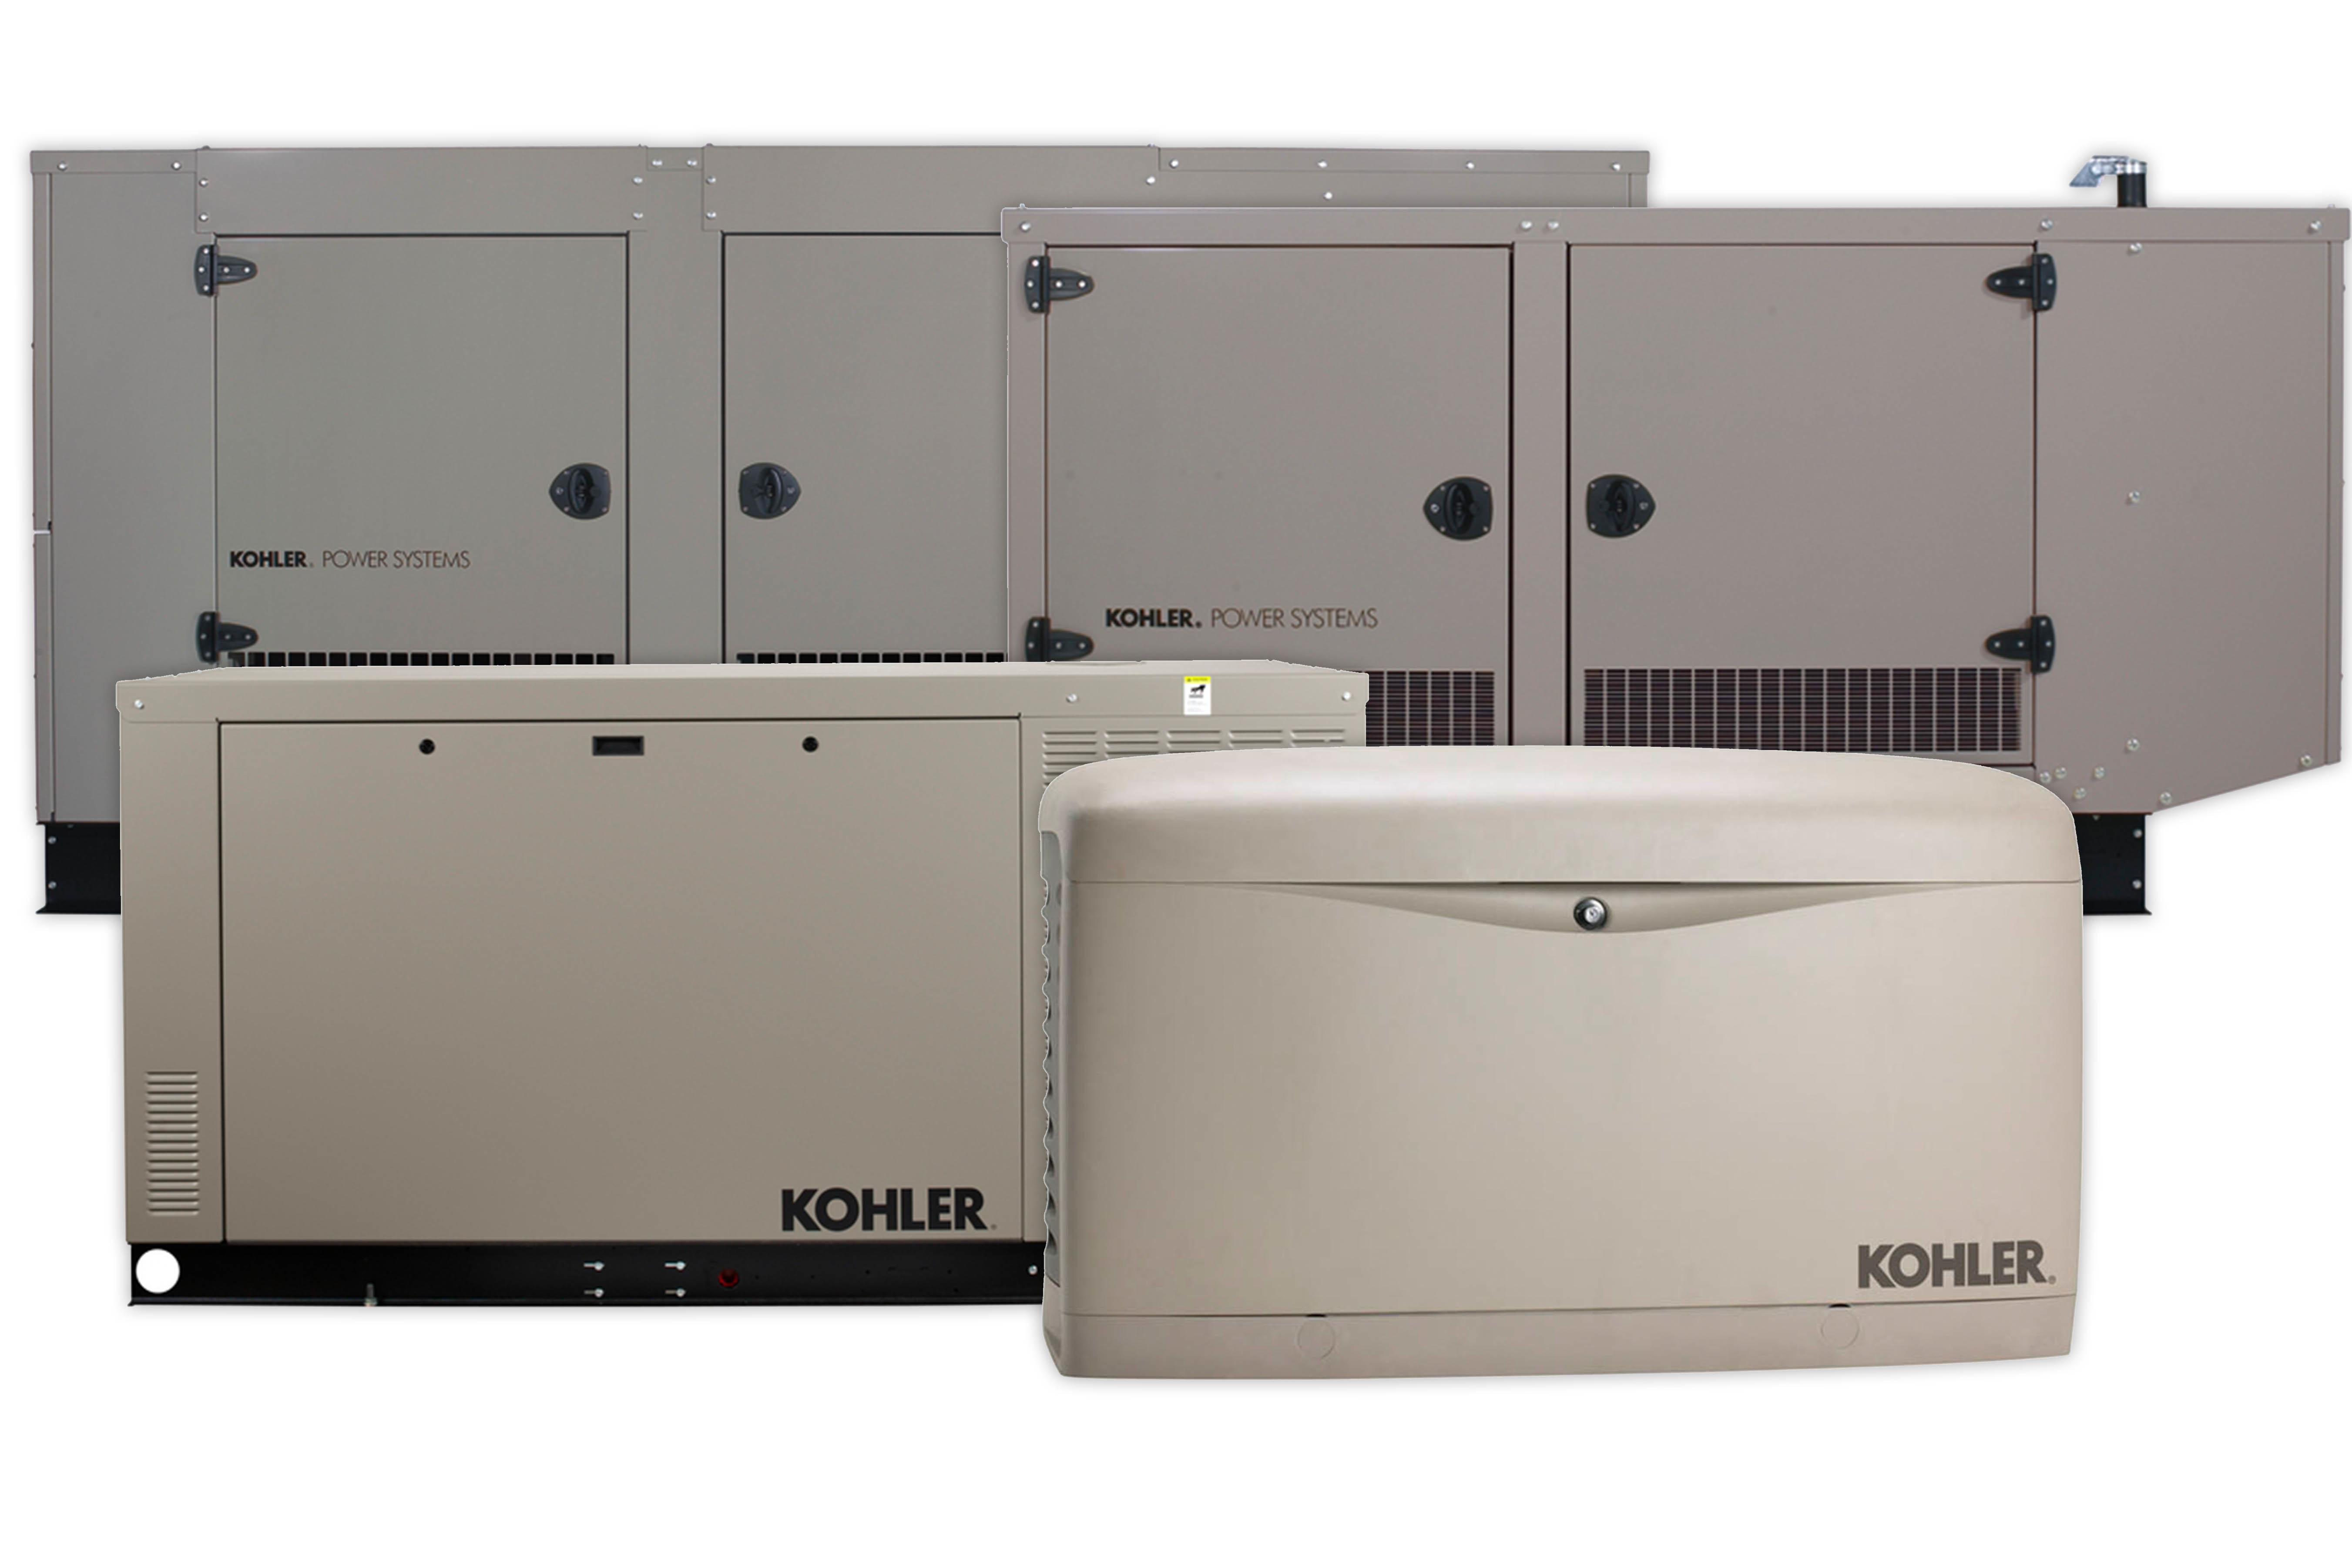 Kohler home standby generators